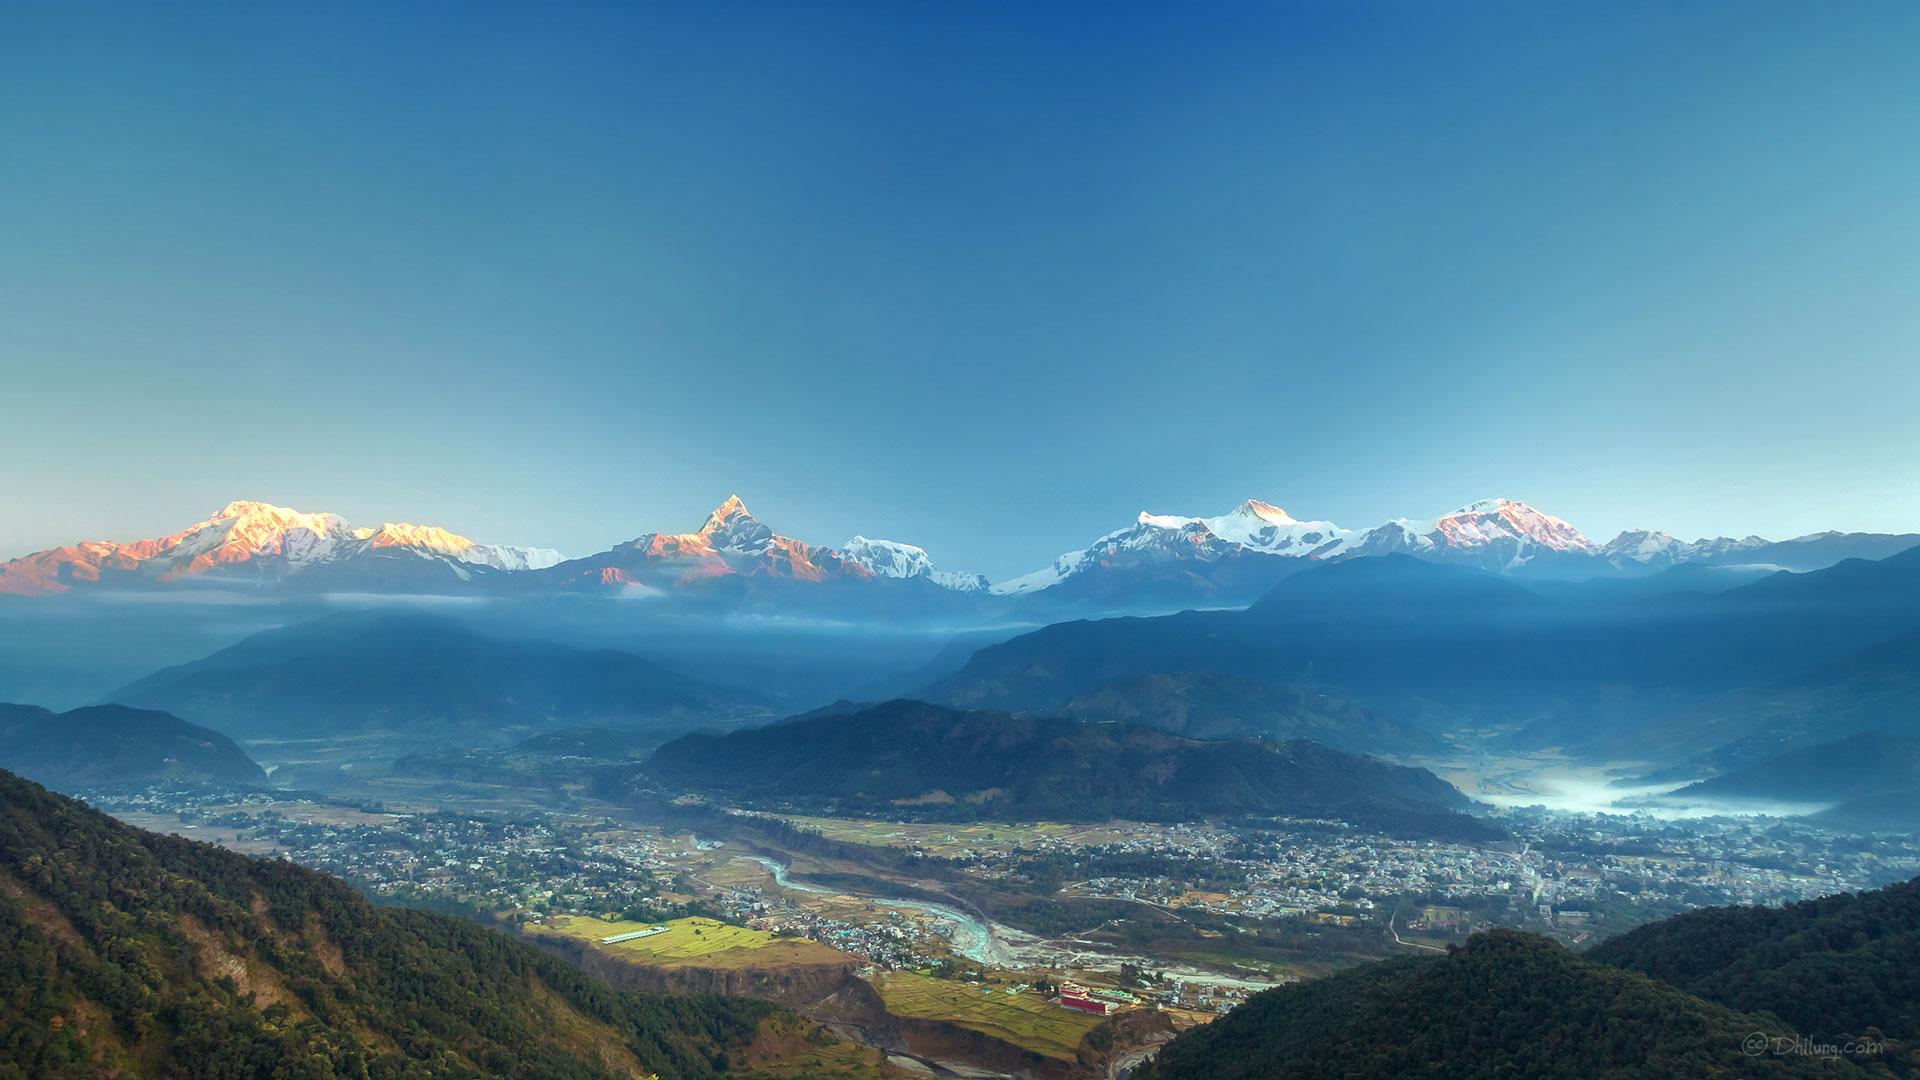 Photo: Nepal is in the Himalayas. Mountain sunrise, Sarangkot, Pokhara, Nepal.